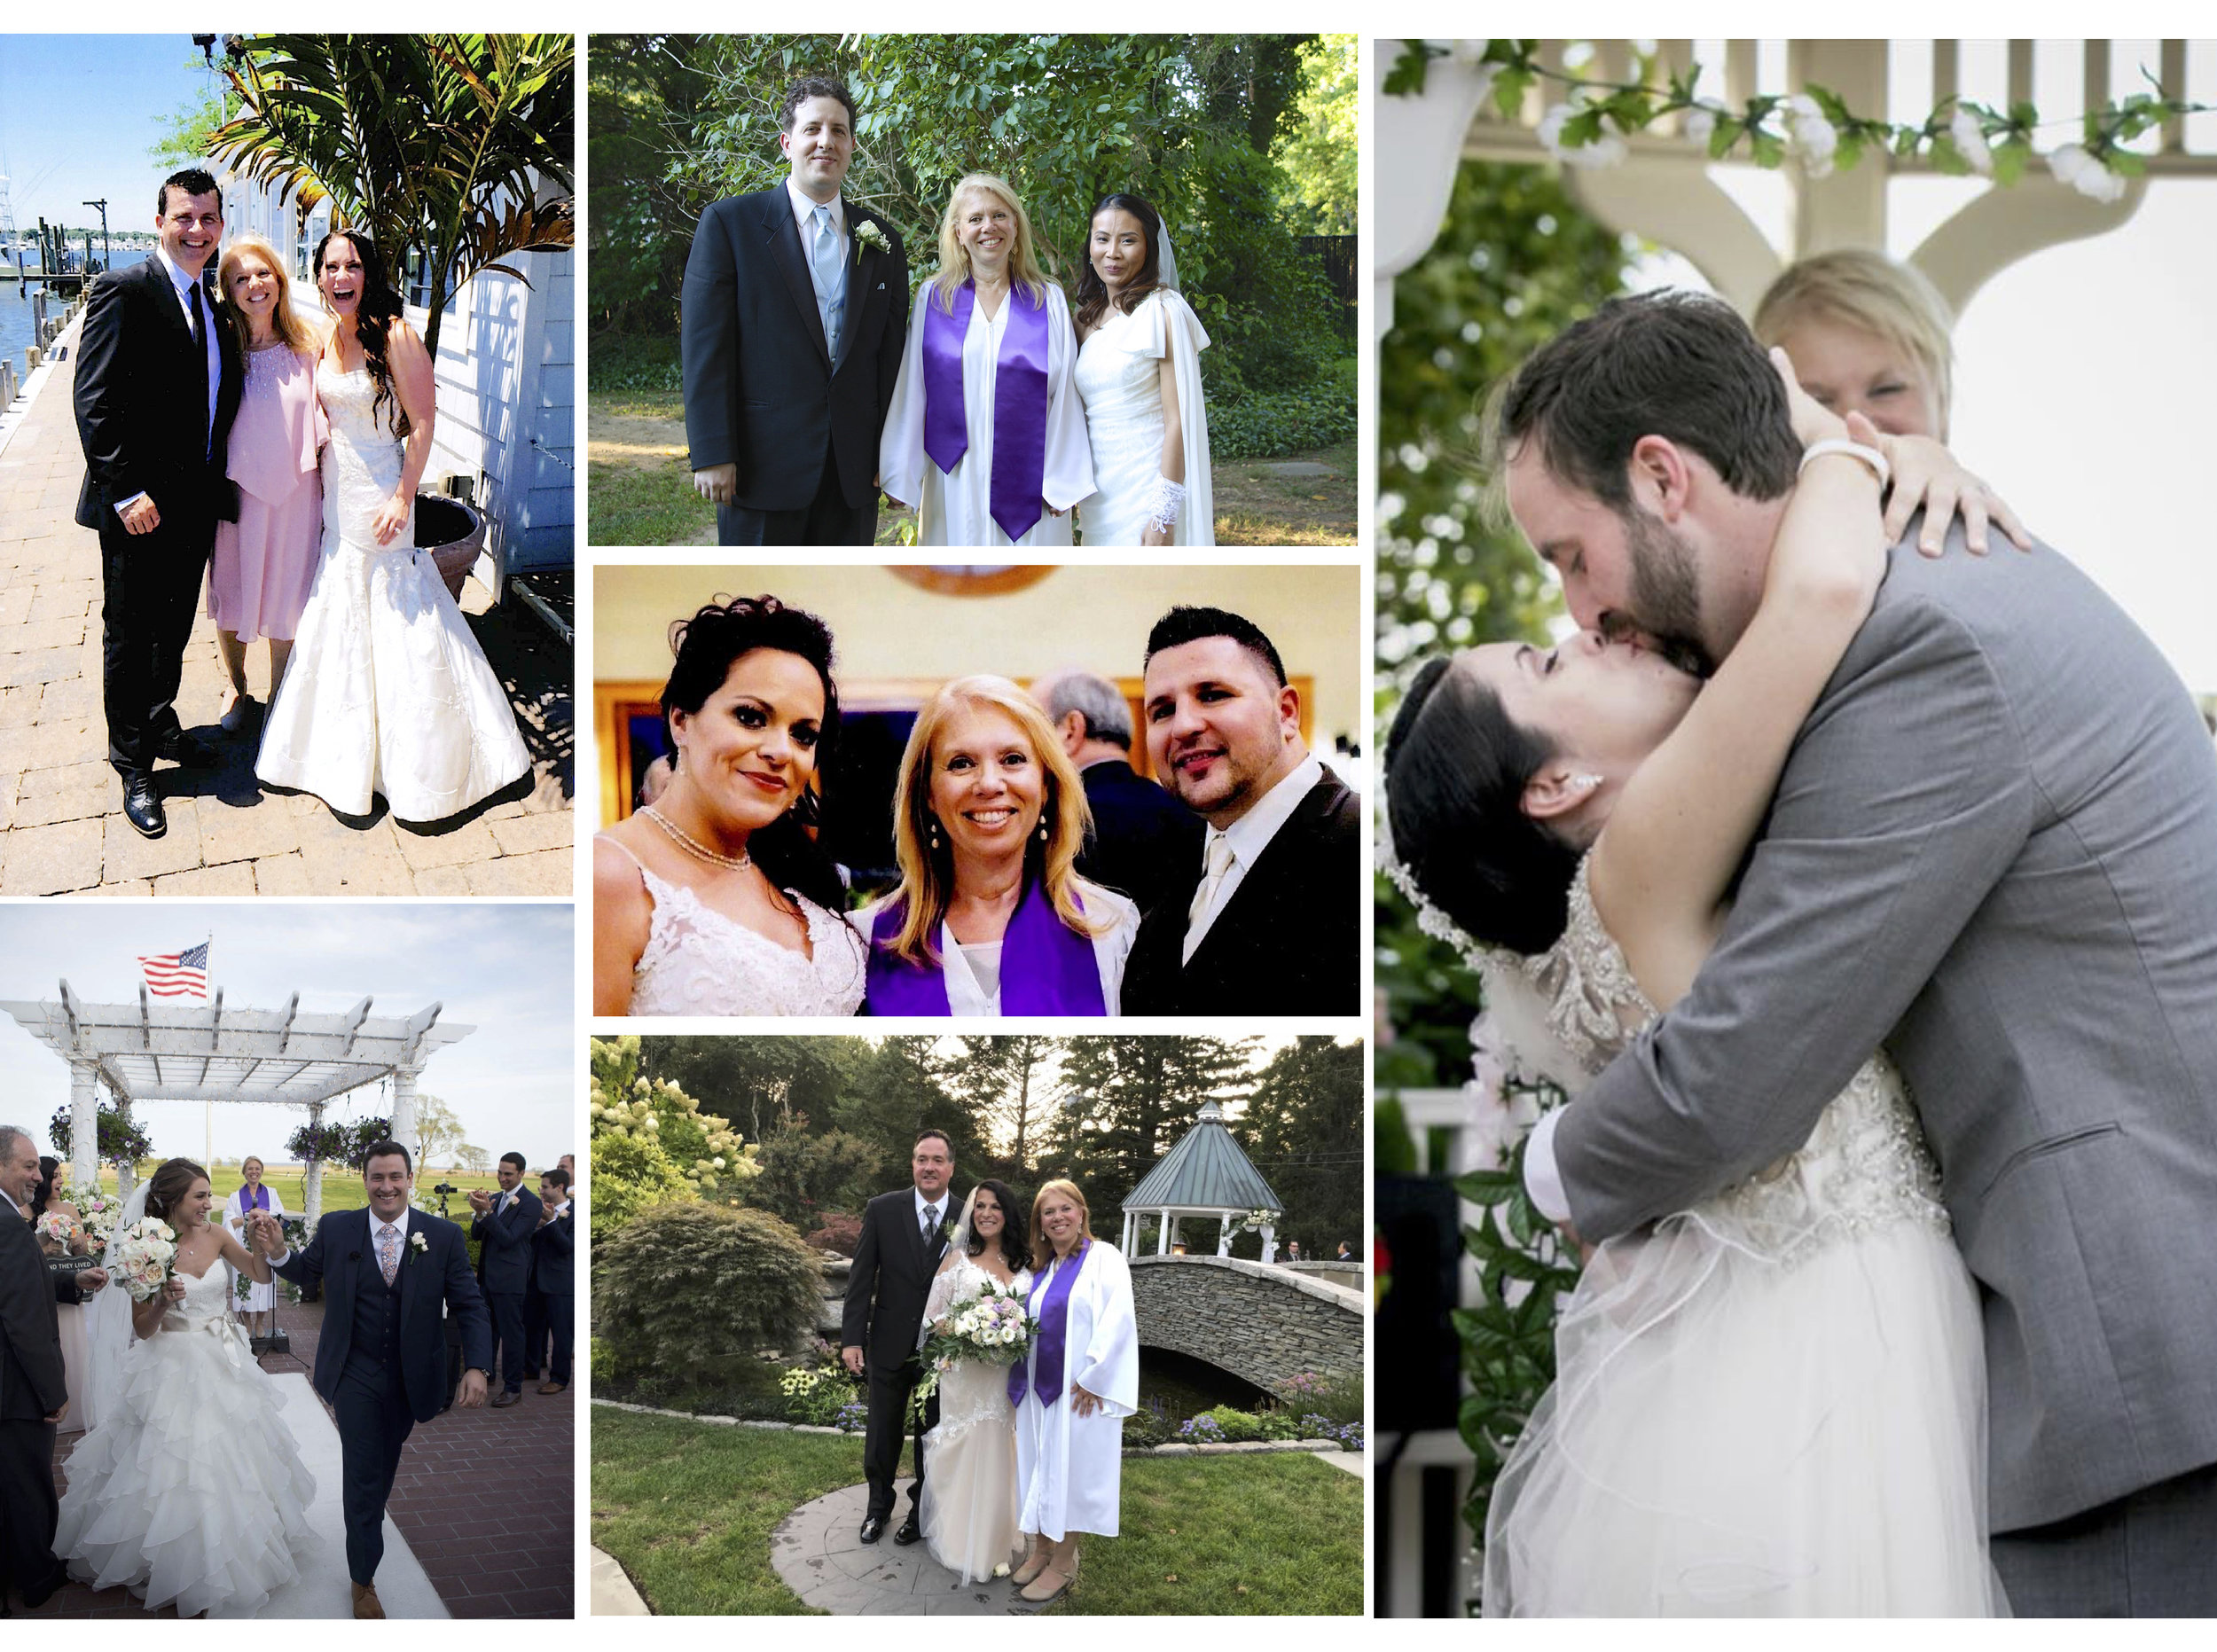 linda wedding collage.jpg